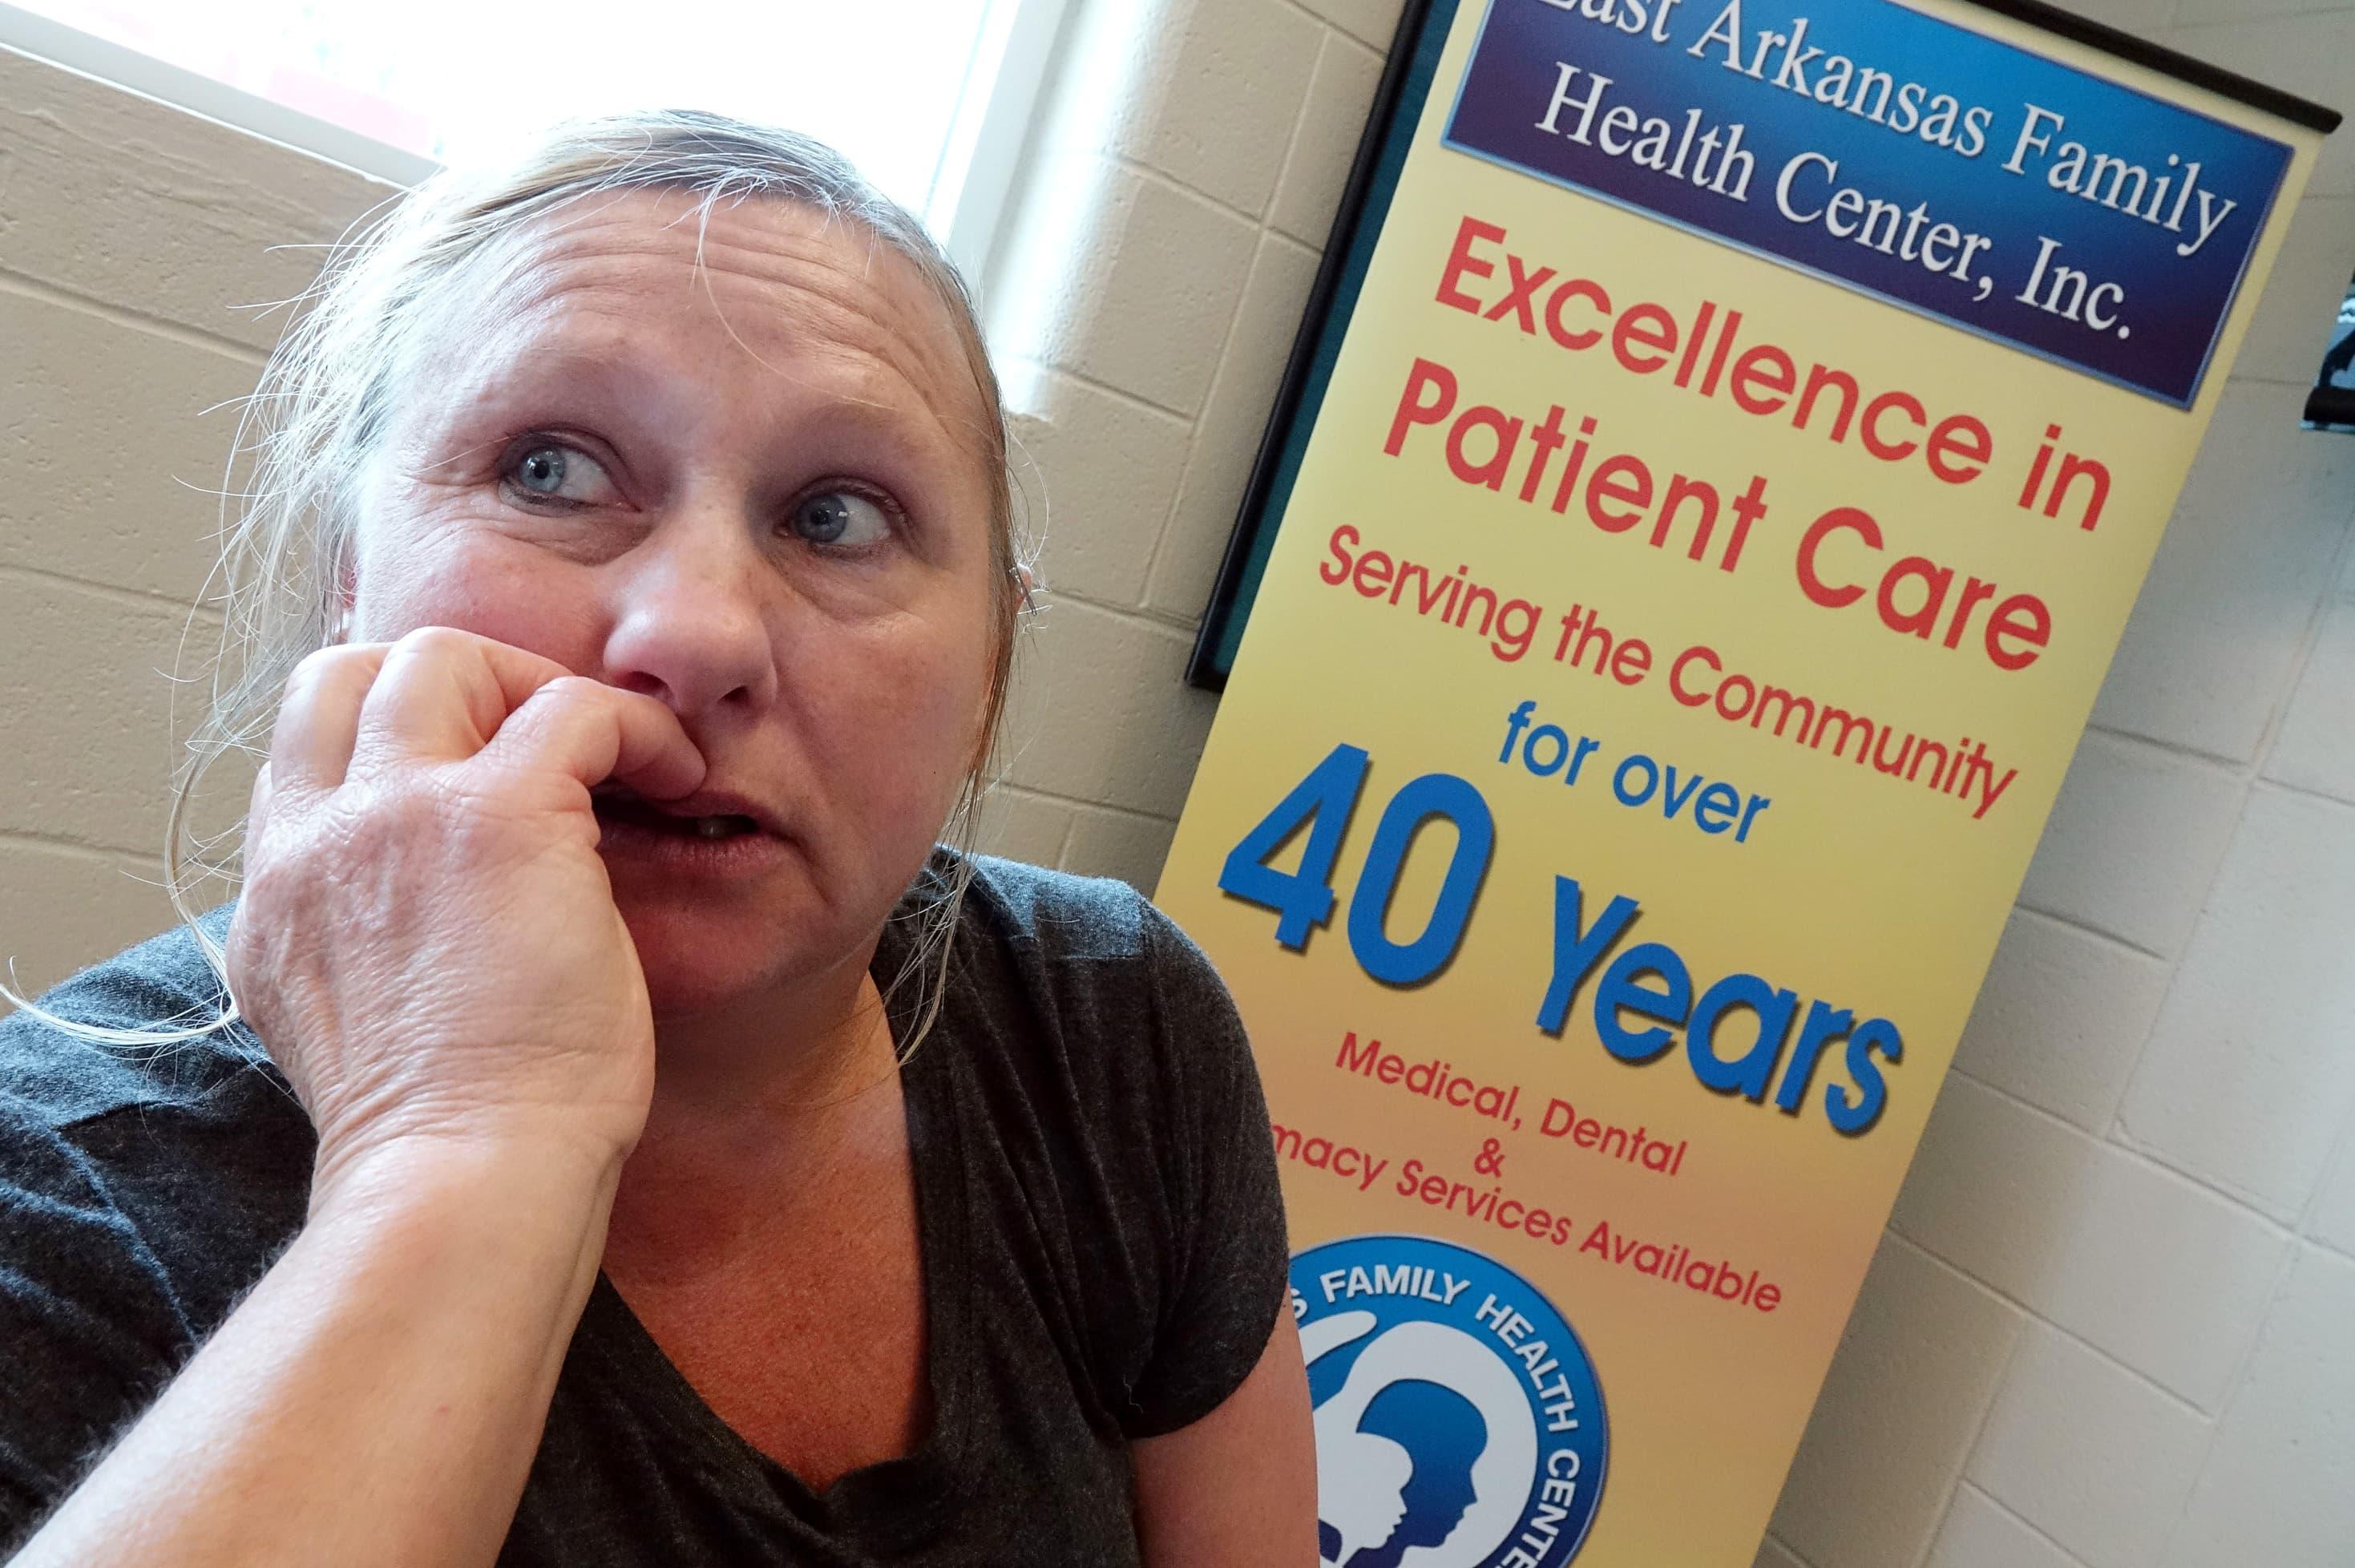 As Arkansas ushers in new Trump-era Medicaid rules, thousands fear